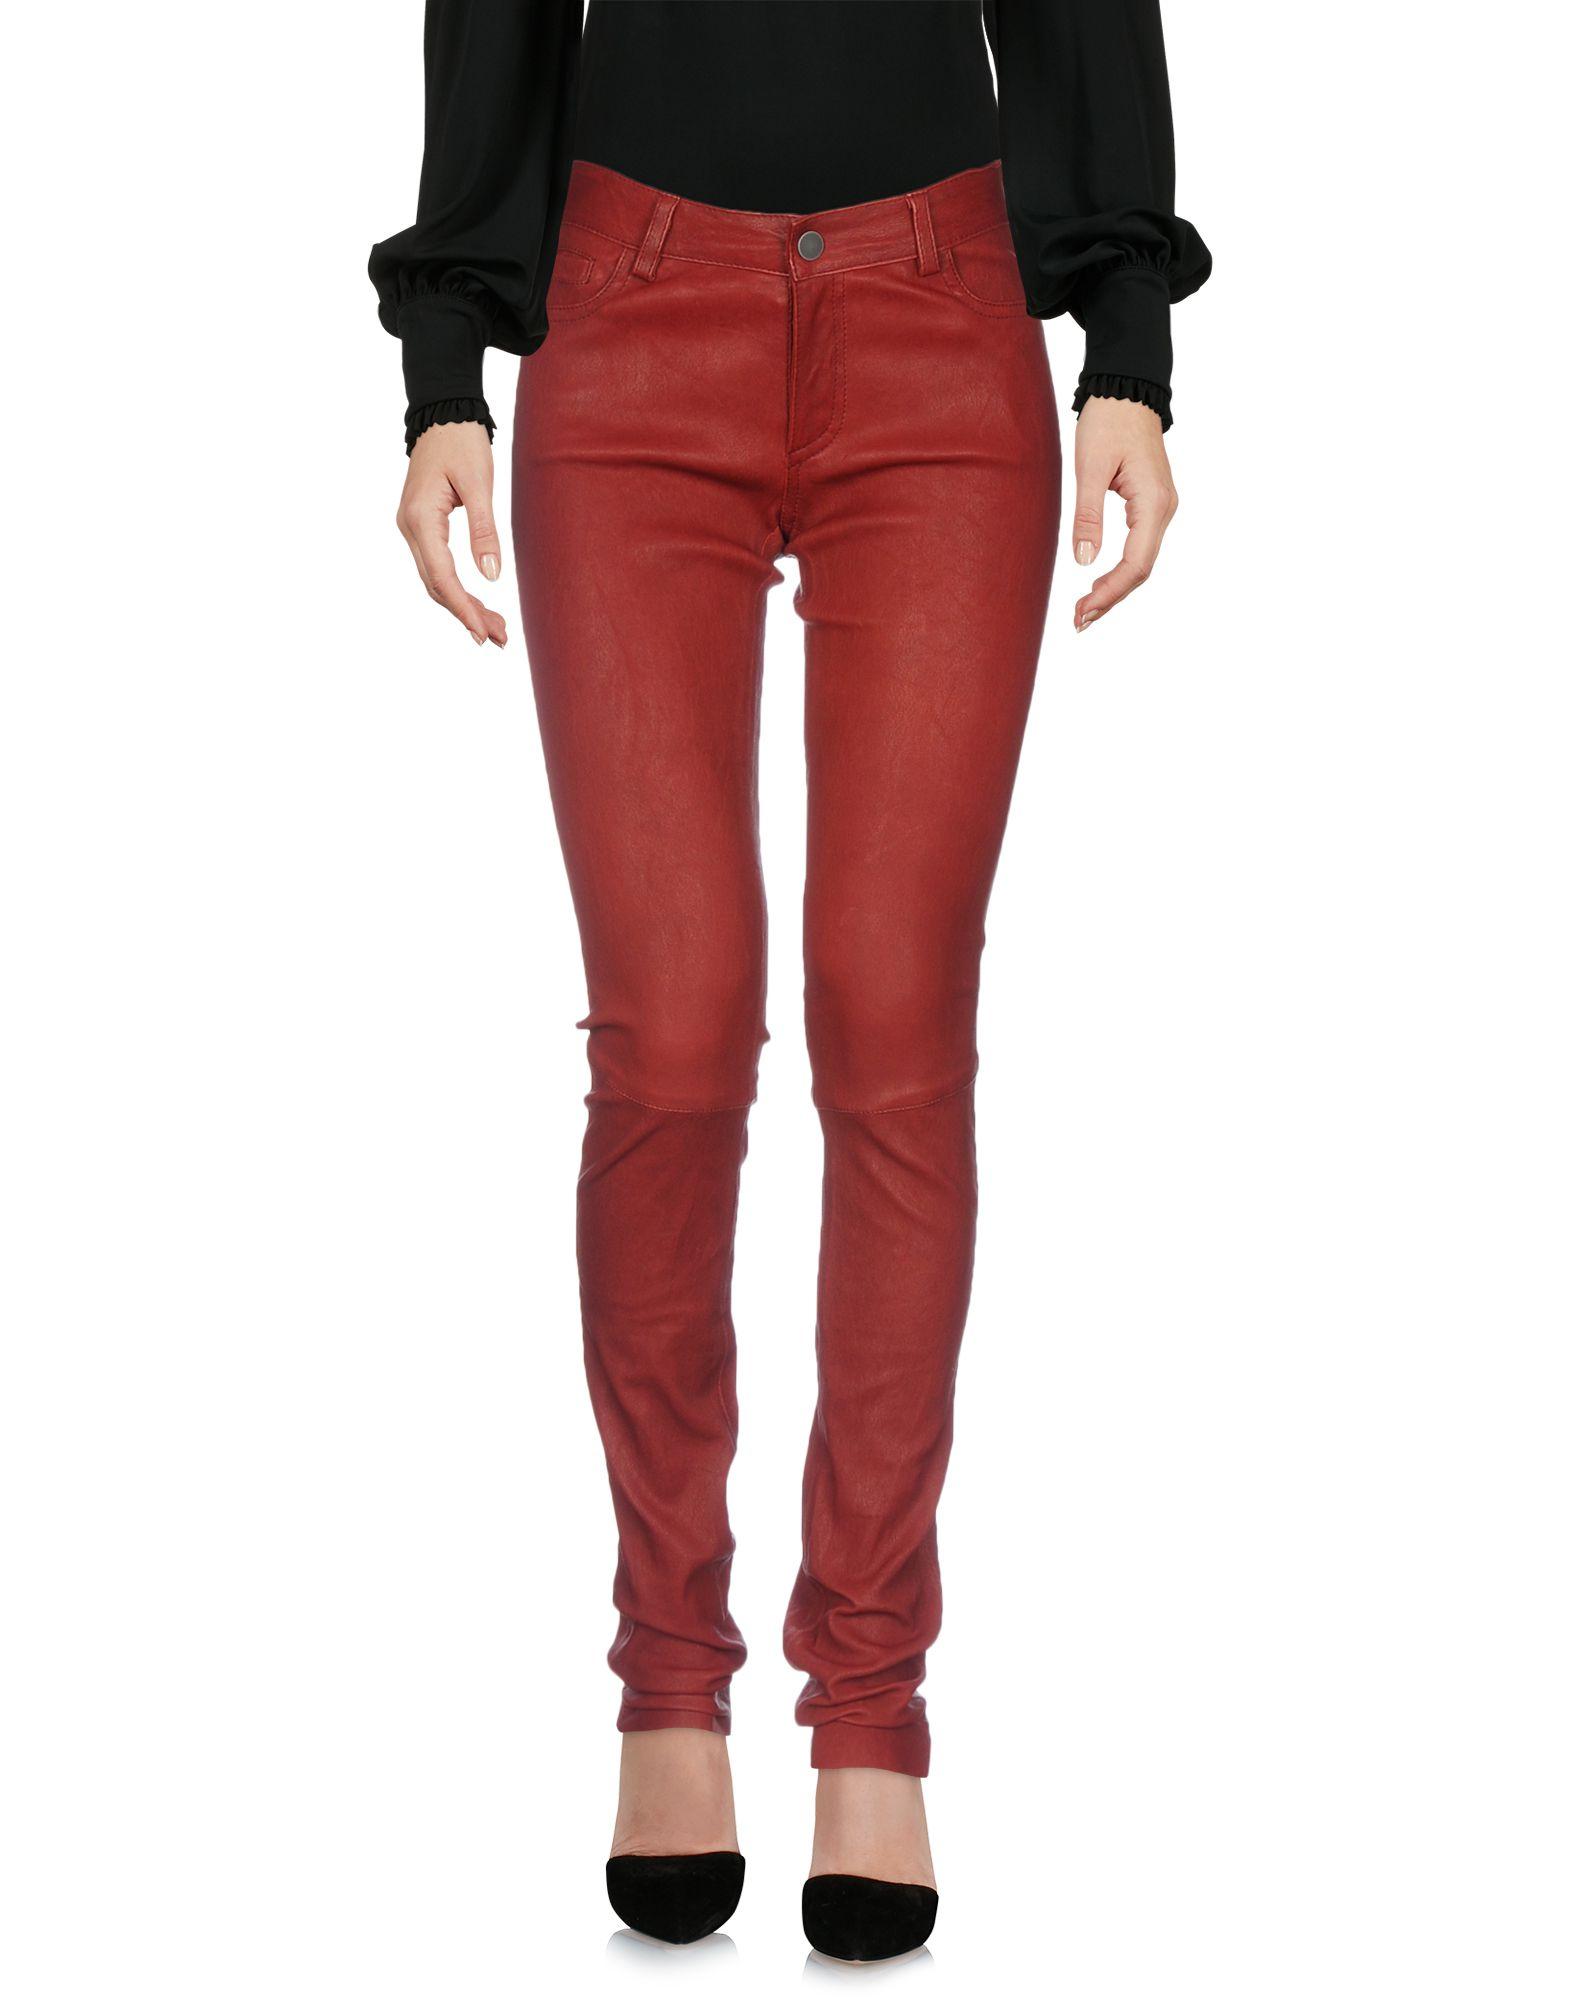 Pantalone Lapis Donna - Acquista online su 3fuEoV